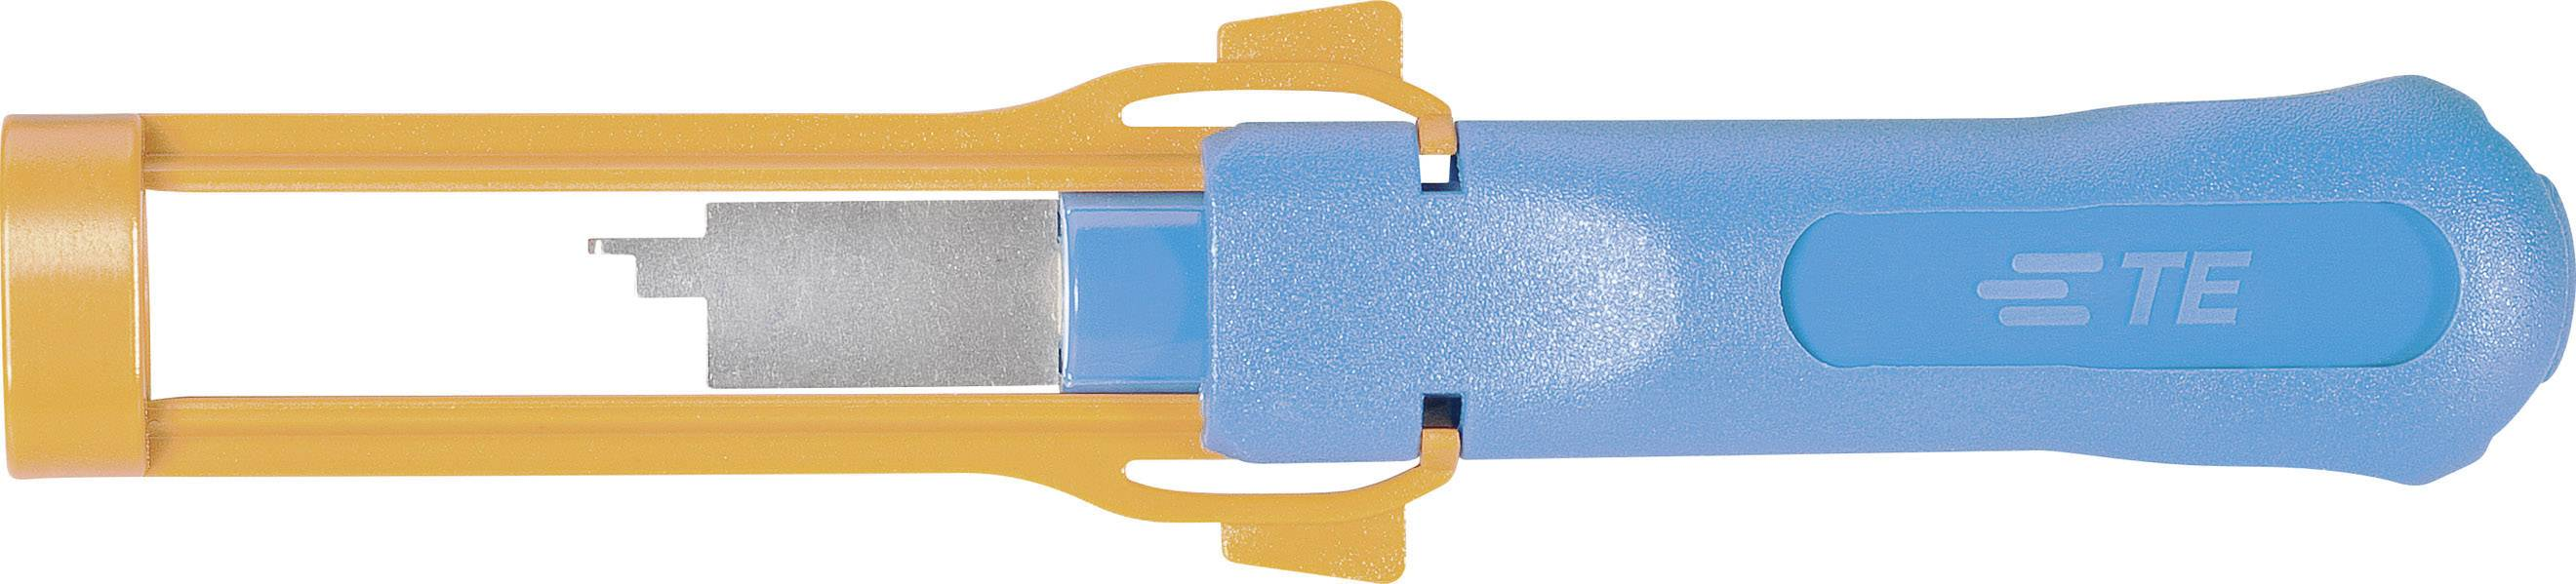 Extrakční nástroj TE Connectivity Mikro-MaTch (5-1579008-3), CuSn